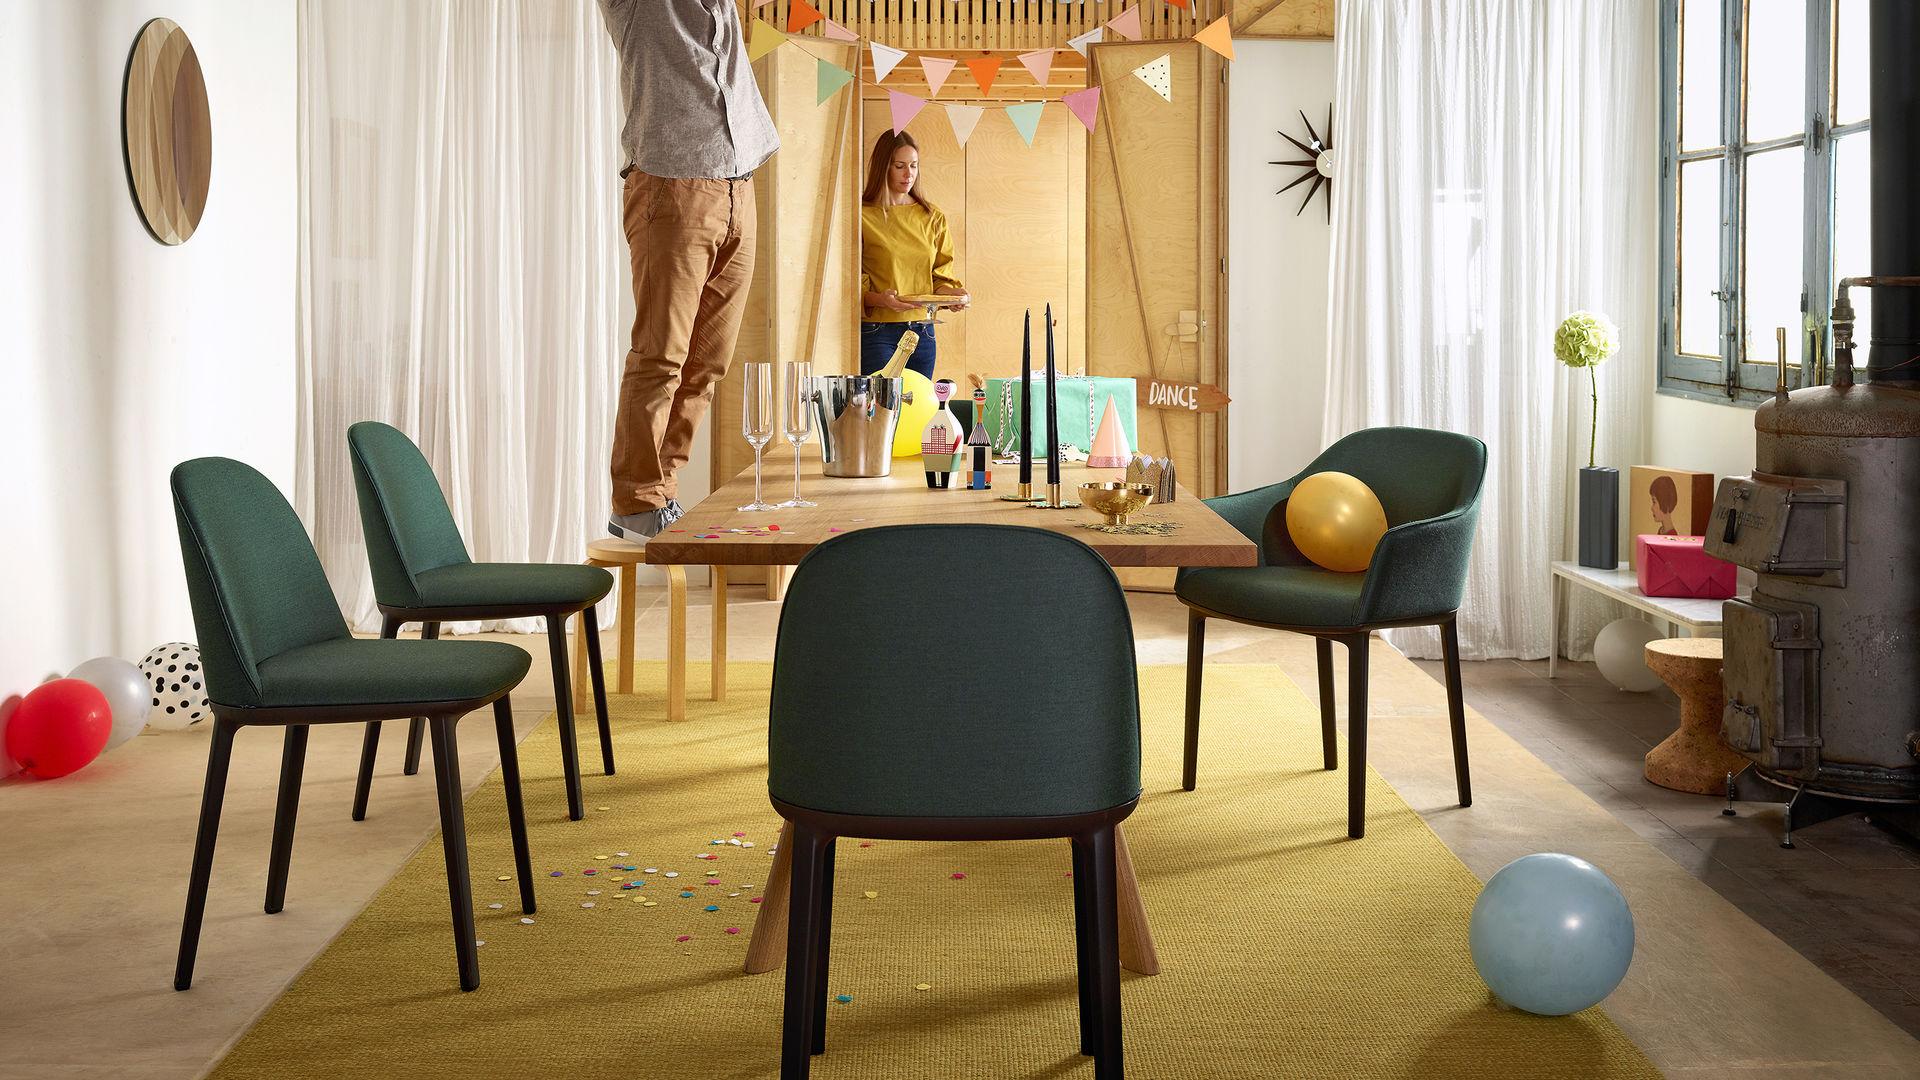 Softshell Side Chair Table Solvay Sunburst Clock Cork Family Modell B Nuage Candle Holder_web_16-9